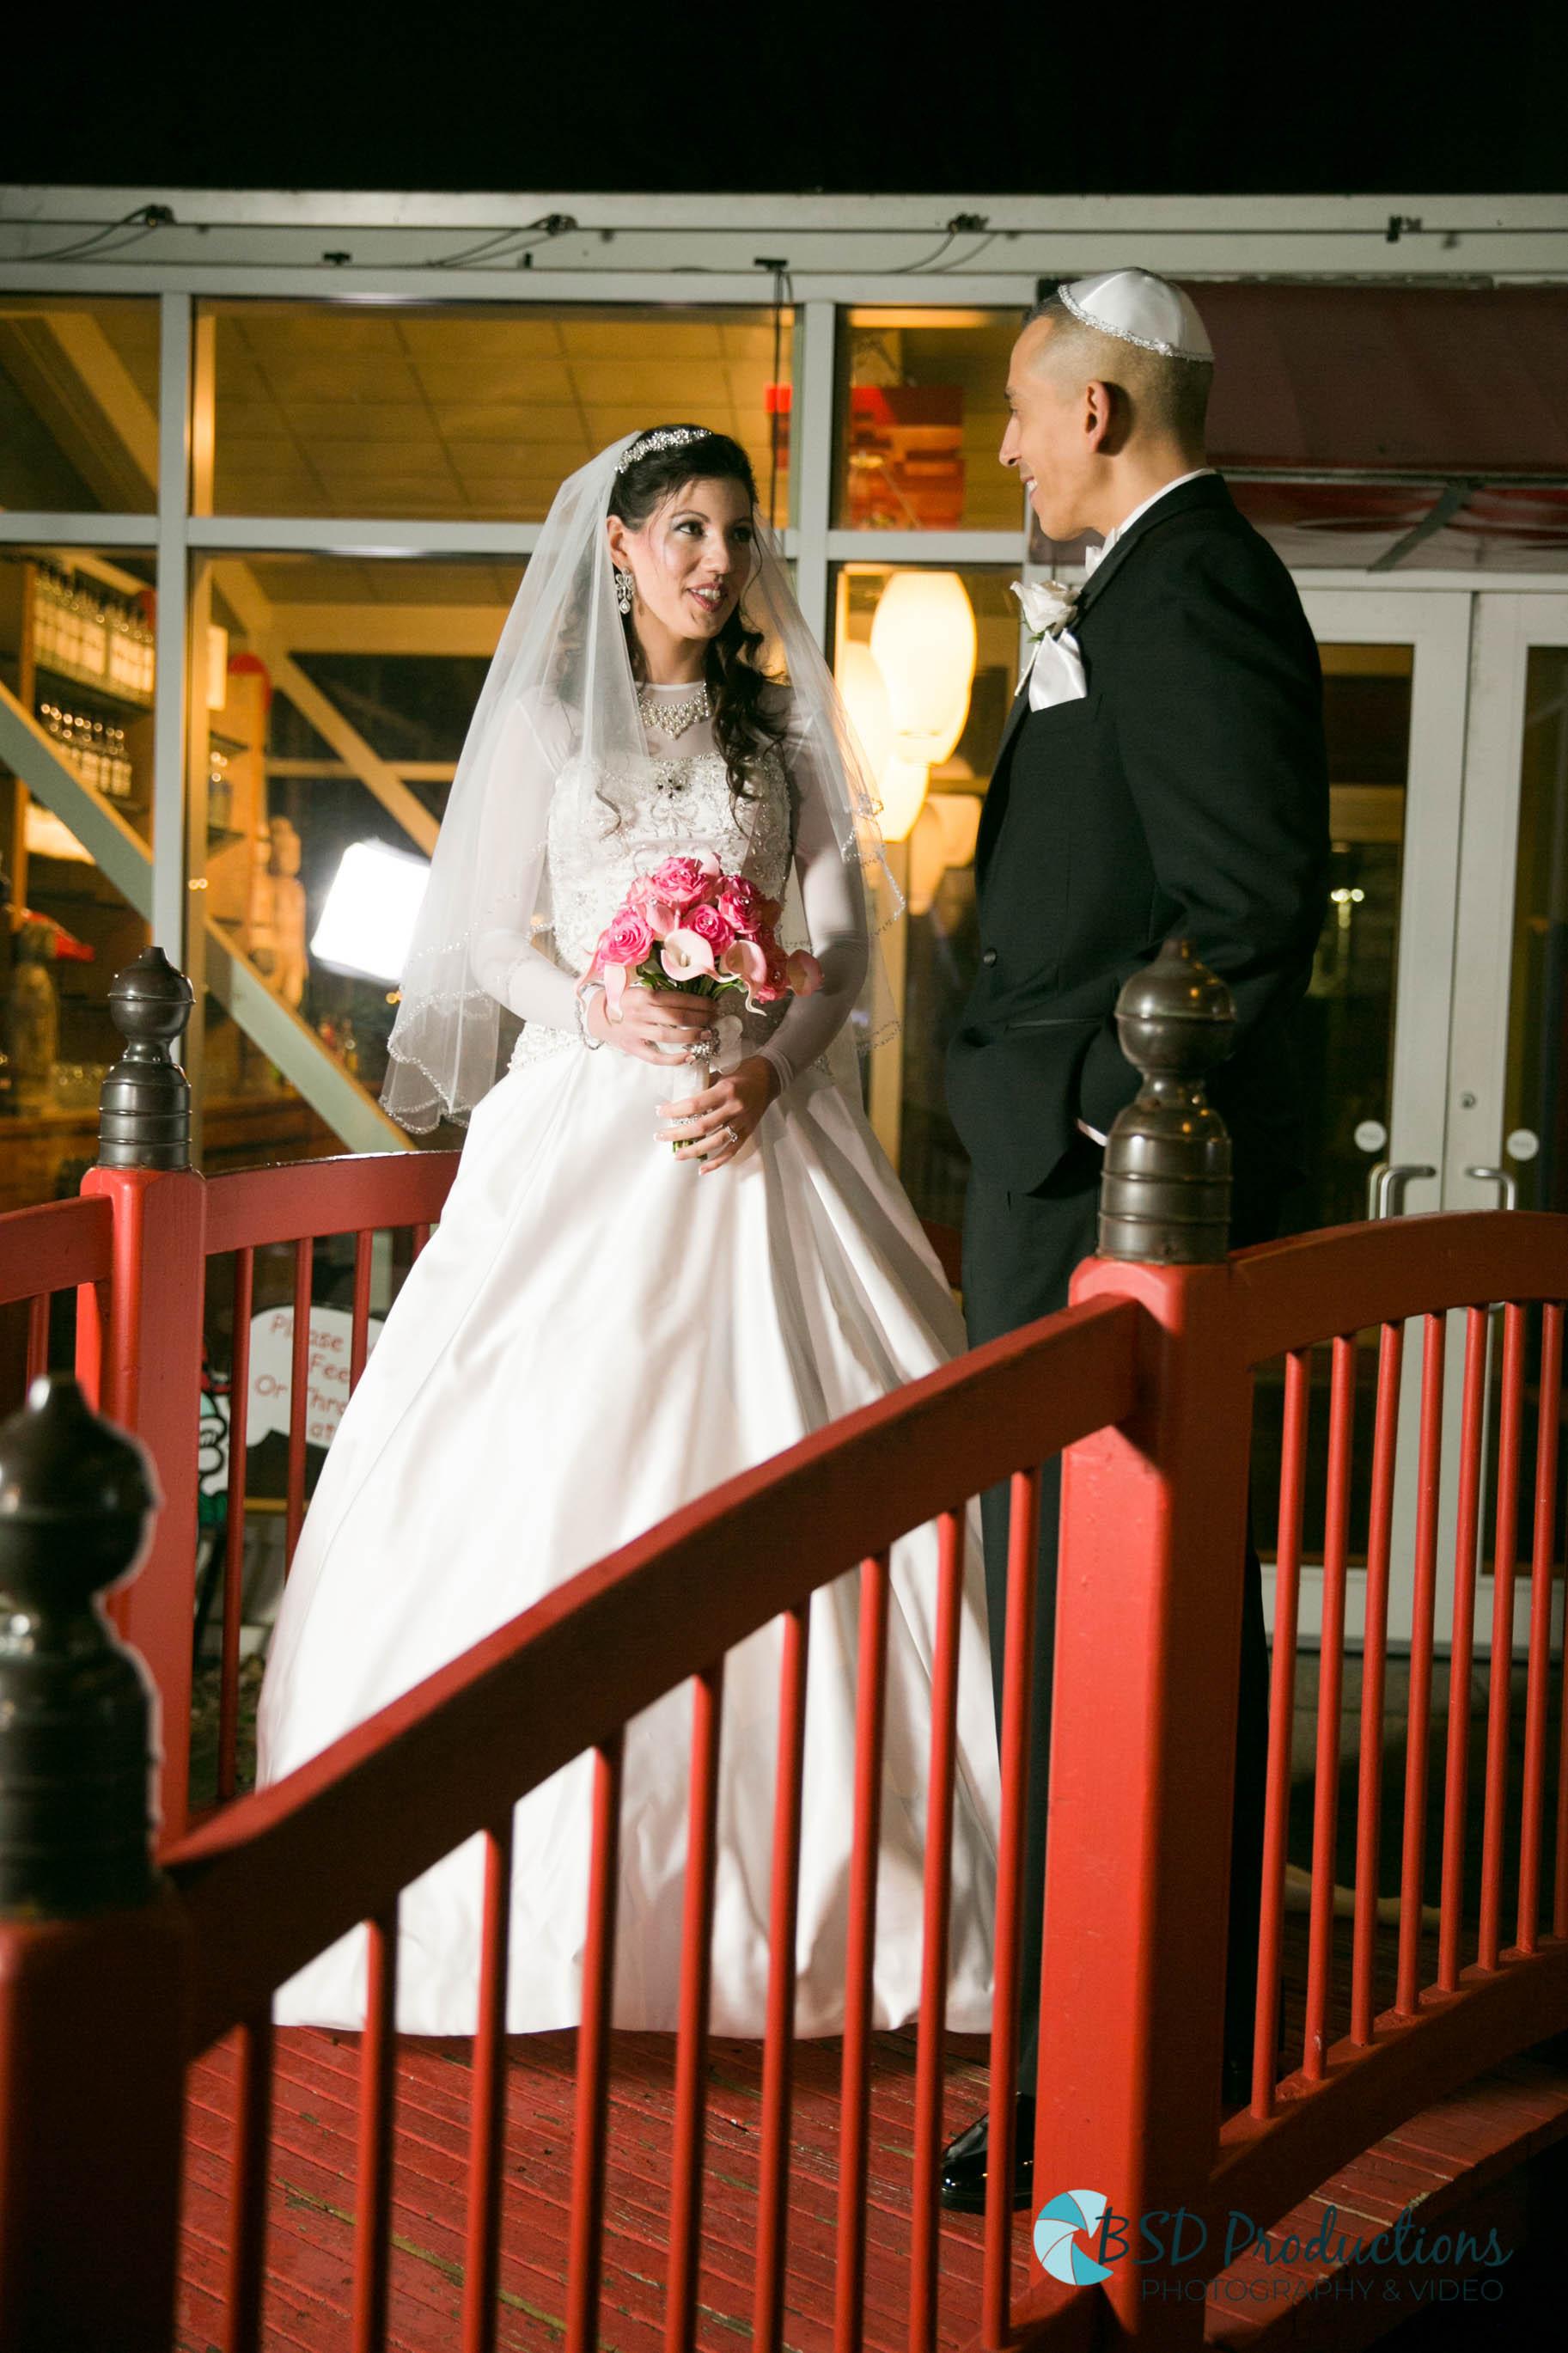 D_R_0027 Wedding – BSD Productions Photography